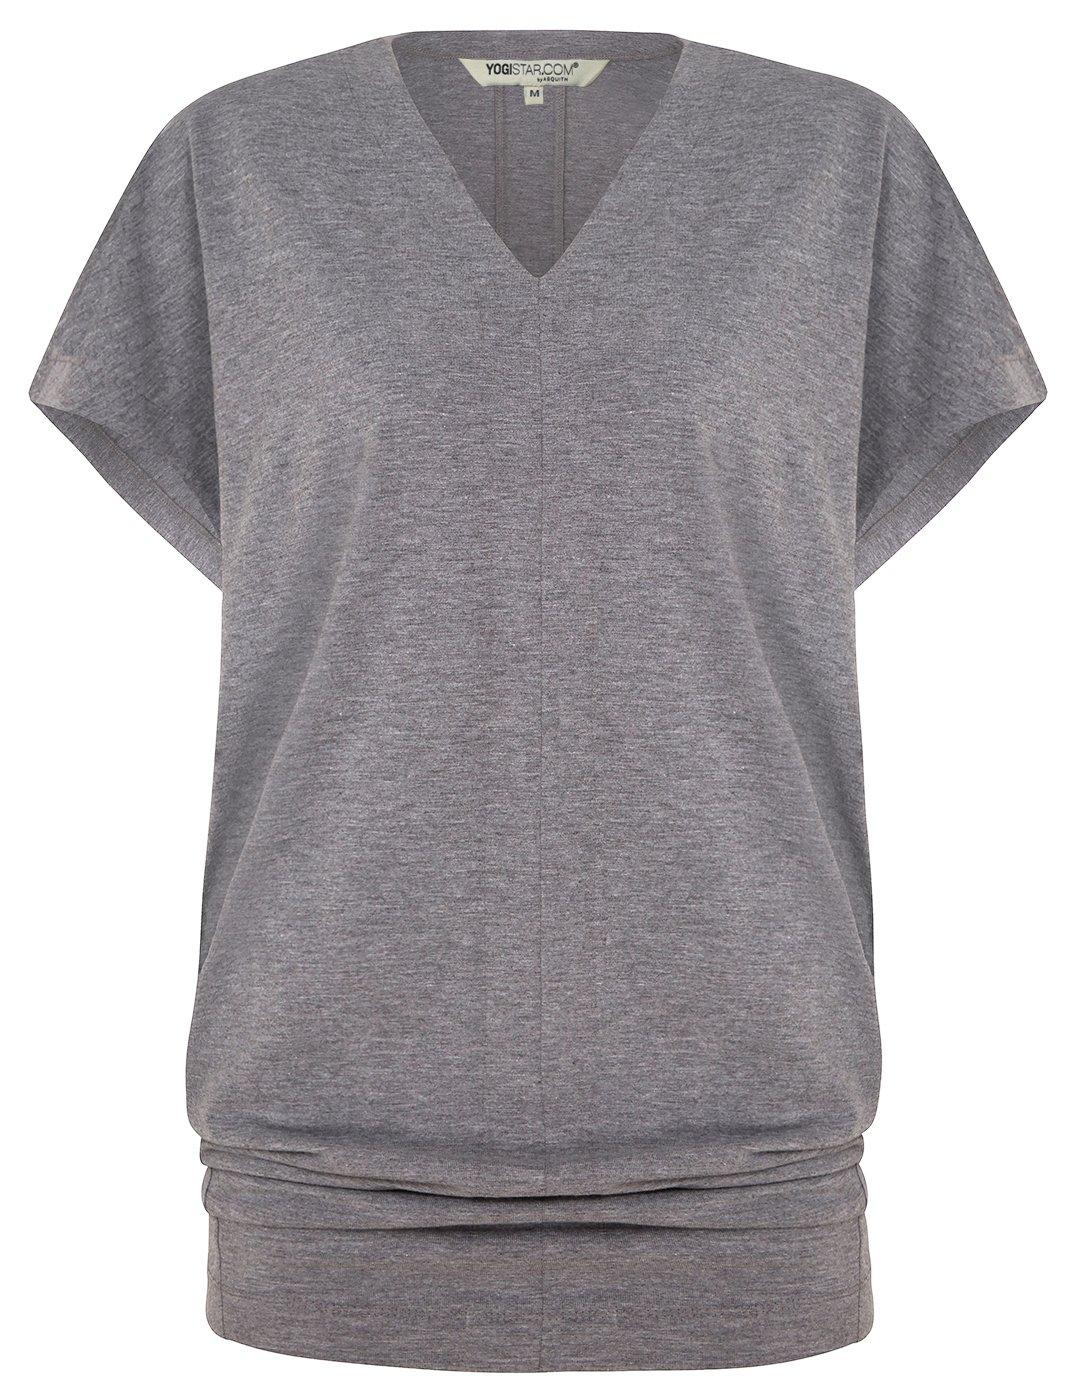 Yogistar Yoga-t-Shirt Freedom - Pale Grau Marl